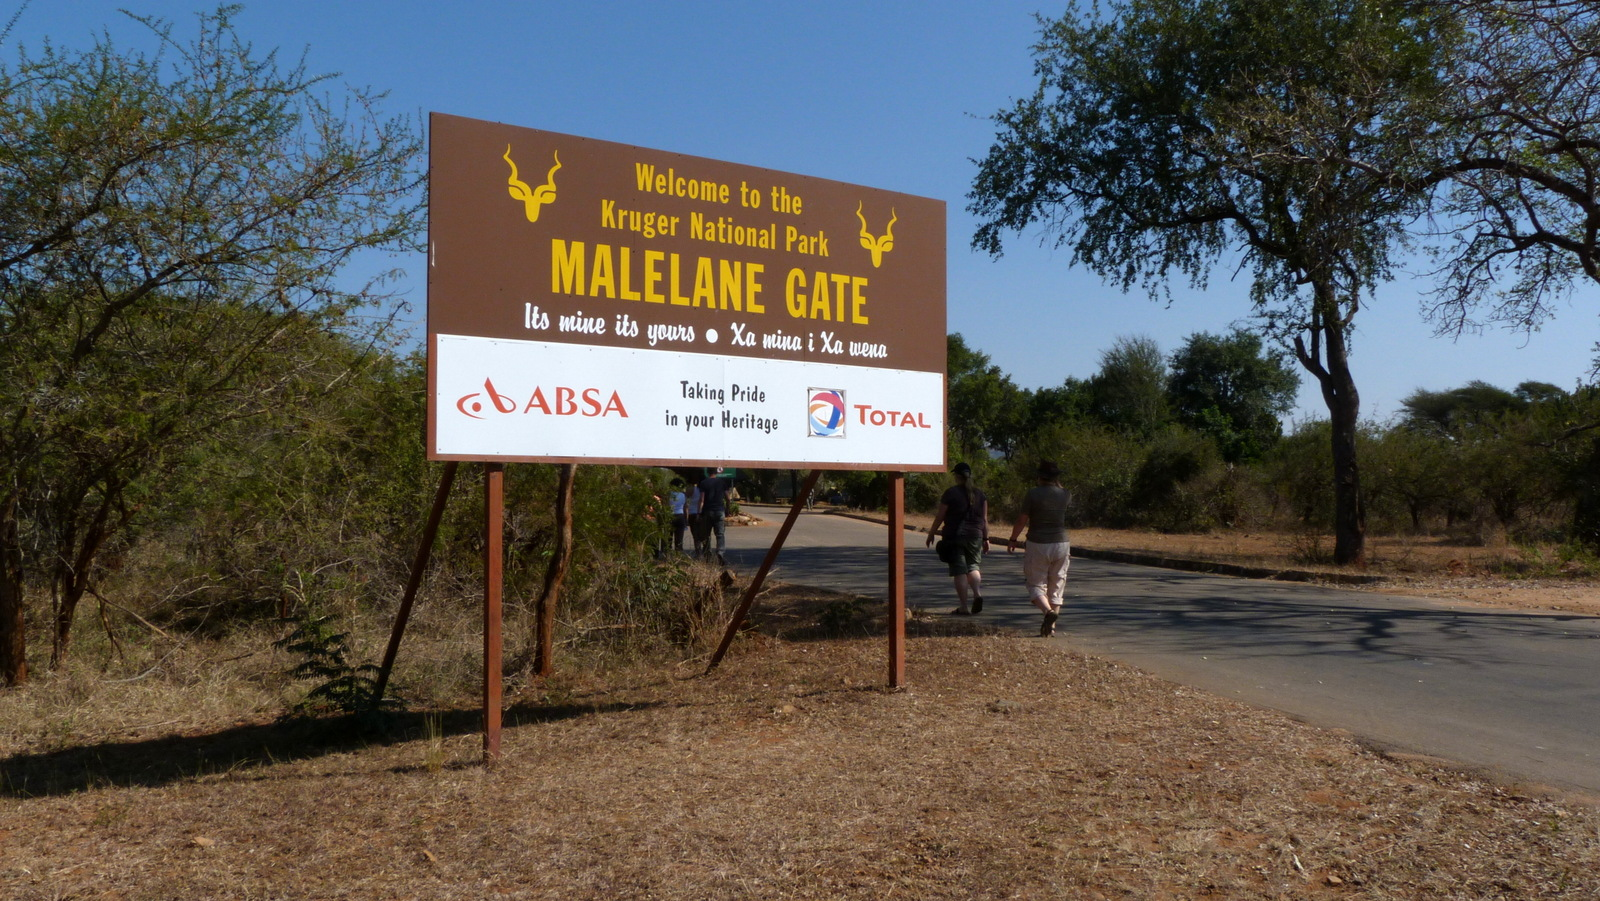 Südafrika und Swasiland Overland. suedafrika staedtereisen sonne safari afrika  P1090455